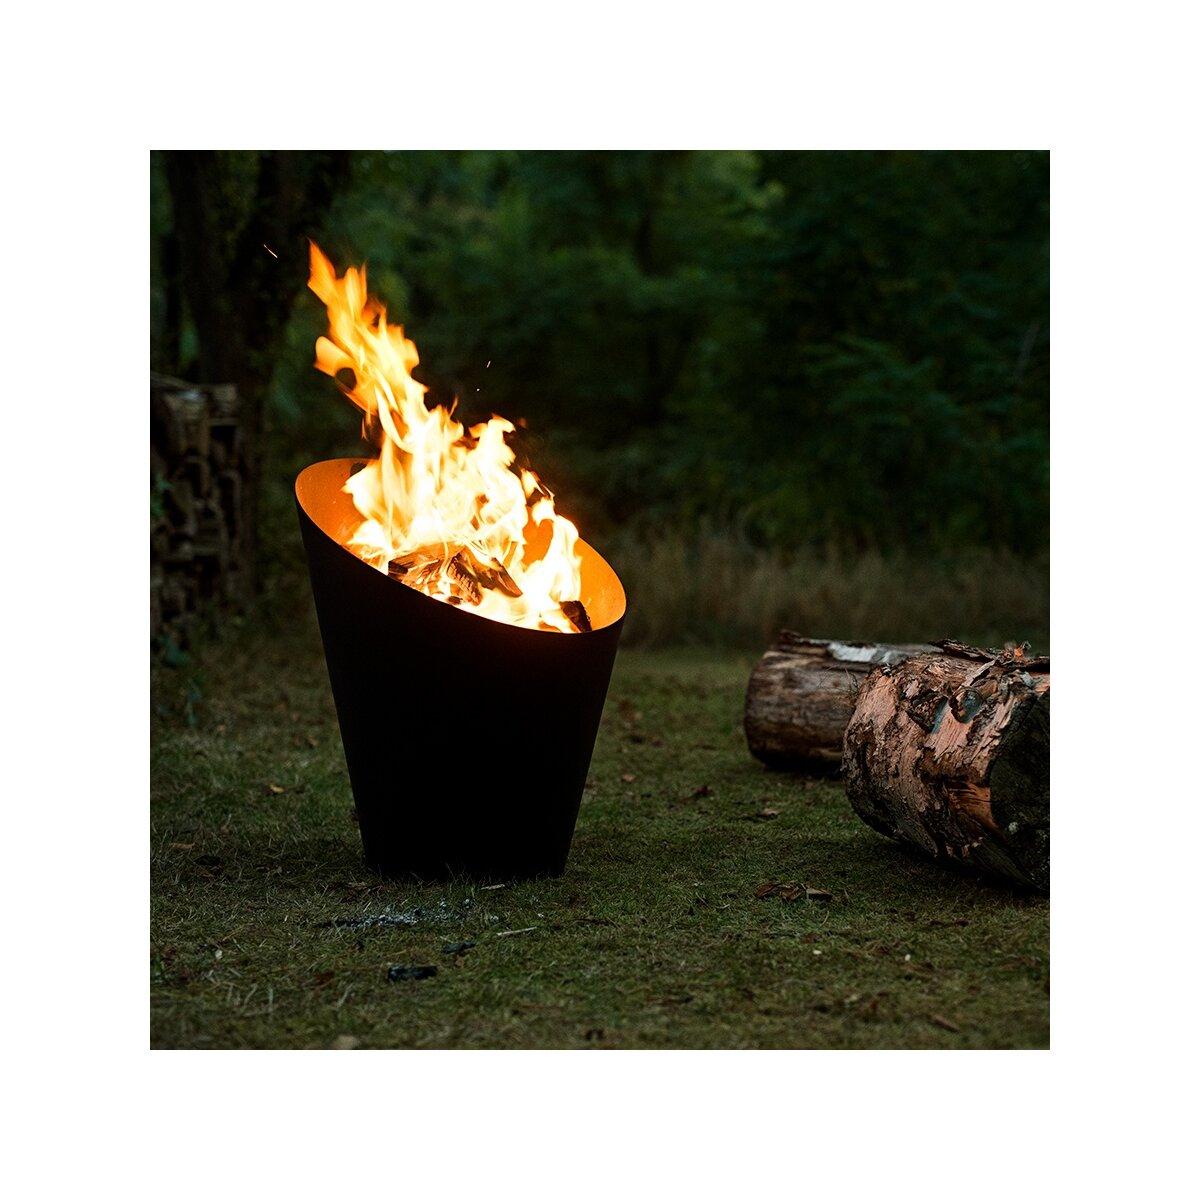 Morsoe Living - Feuerstelle Fire Pot, 179,00 € von Morsoe Living mit ...